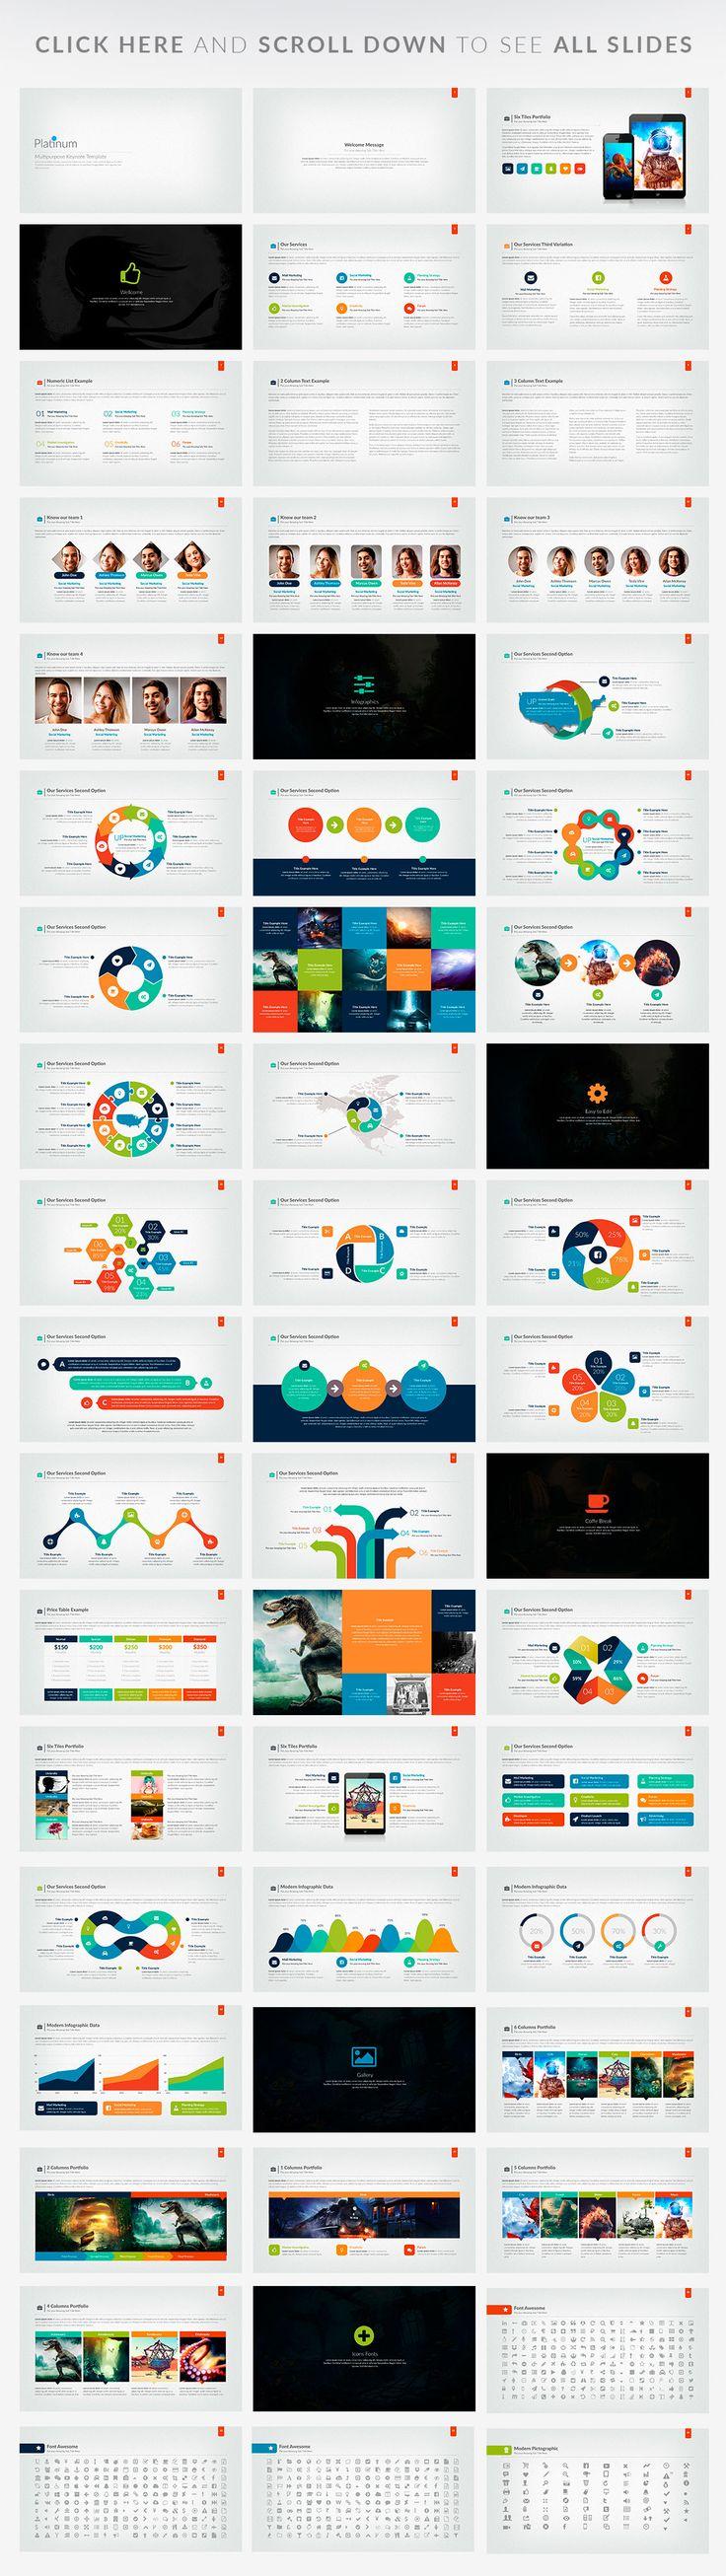 Platinun | Powerpoint Presentation by Zacomic Studios on Creative Market